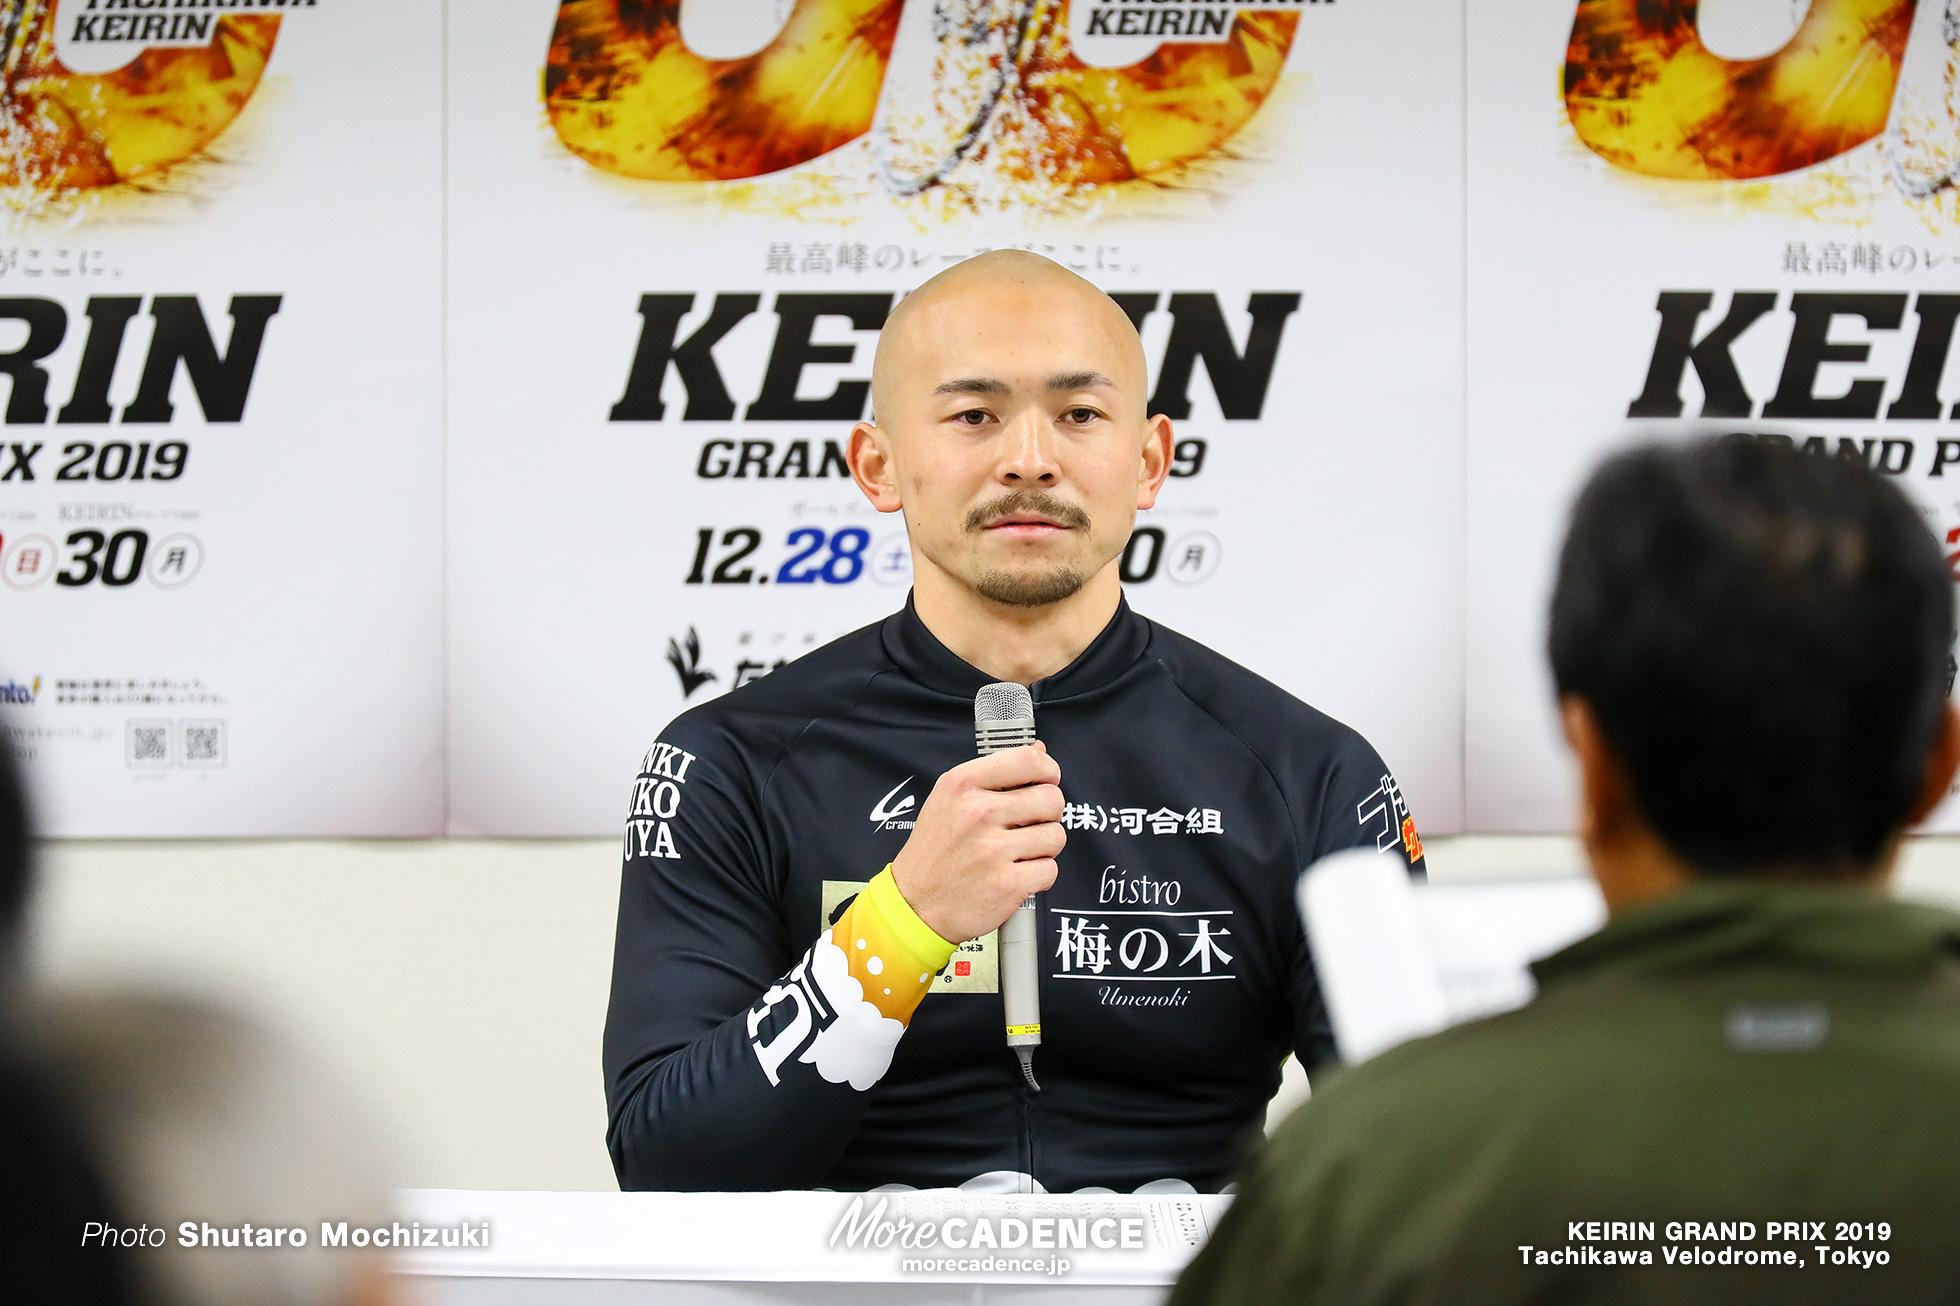 KEIRINグランプリ2019 ヤンググランプリ 前検日